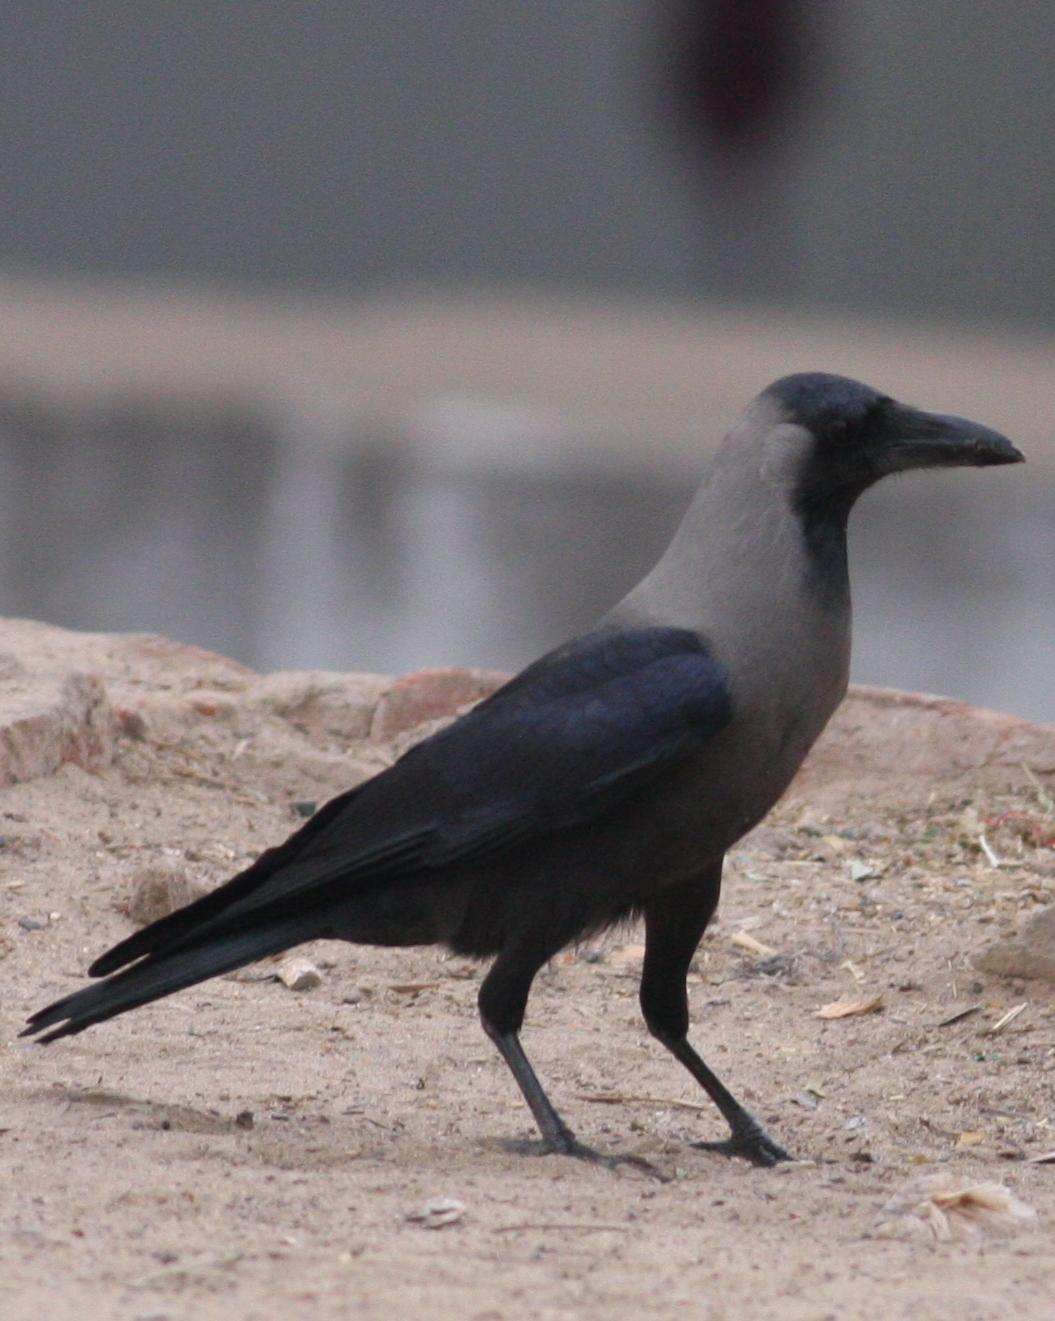 House Crow Photo by Nate Swick